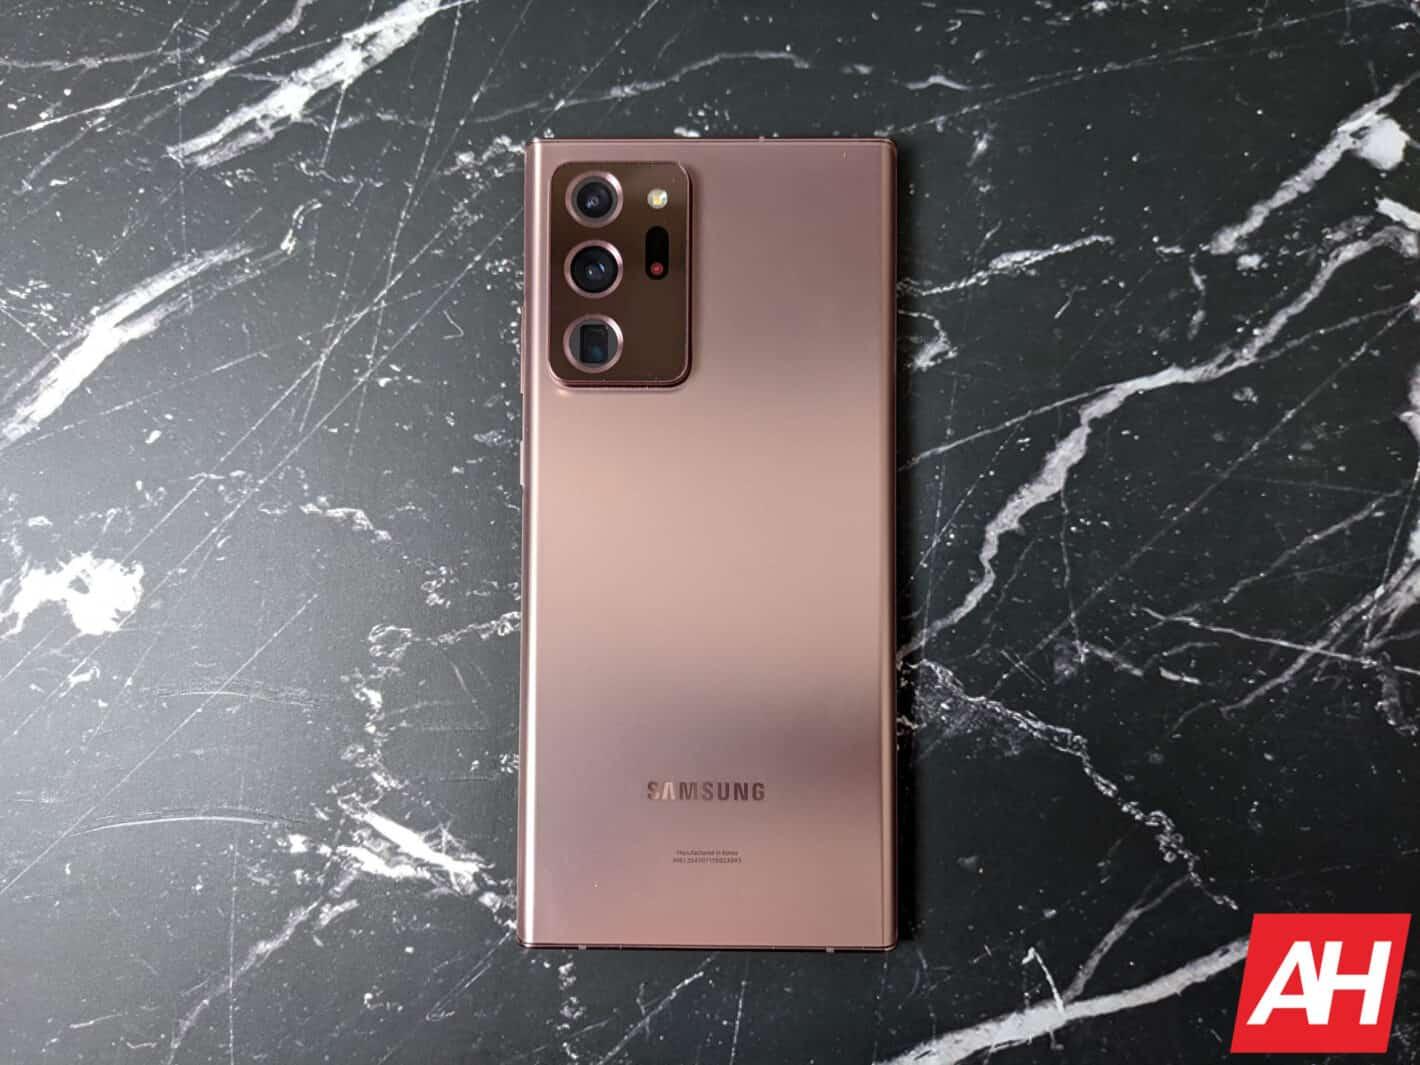 Samsung Galaxy Note 20 Ultra Review AM AH 18